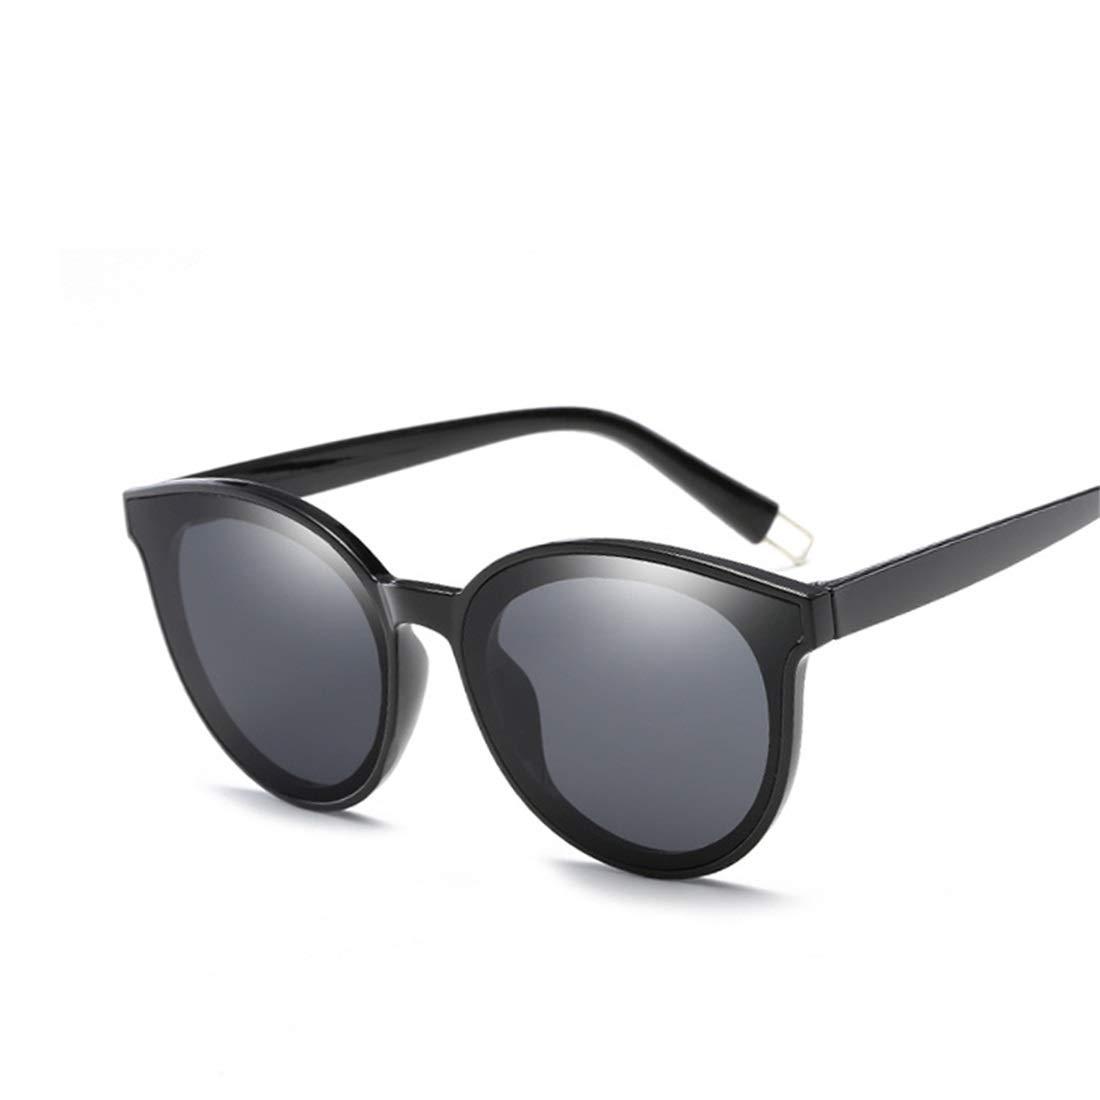 Amazon.com: CHICLI Sunglasses Cat Eye Glasses Women Men ...